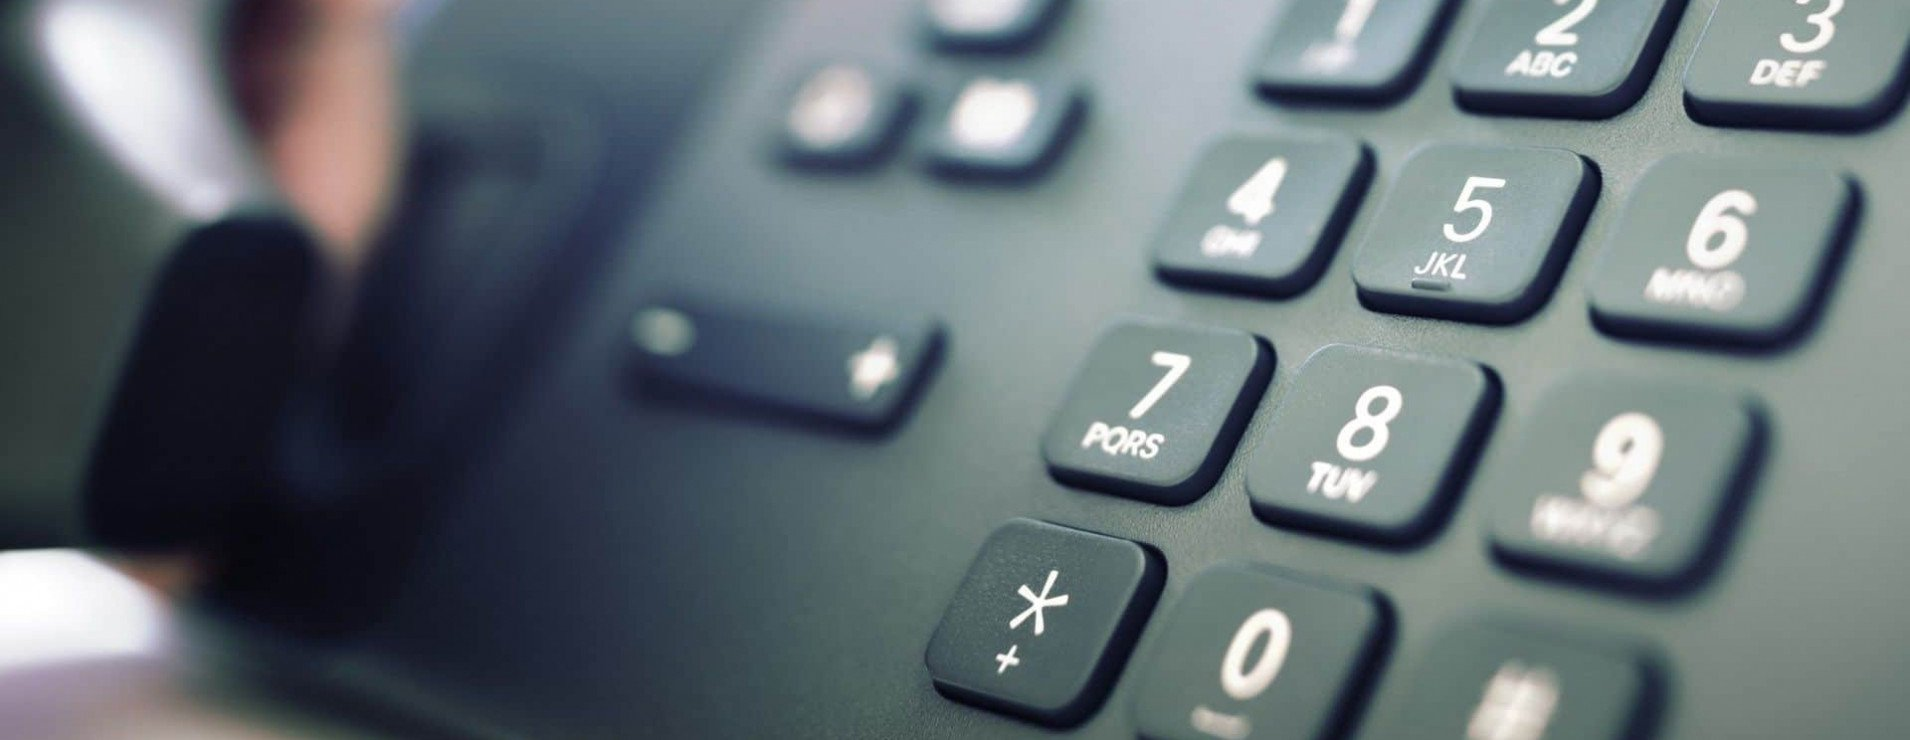 Telecoms Services